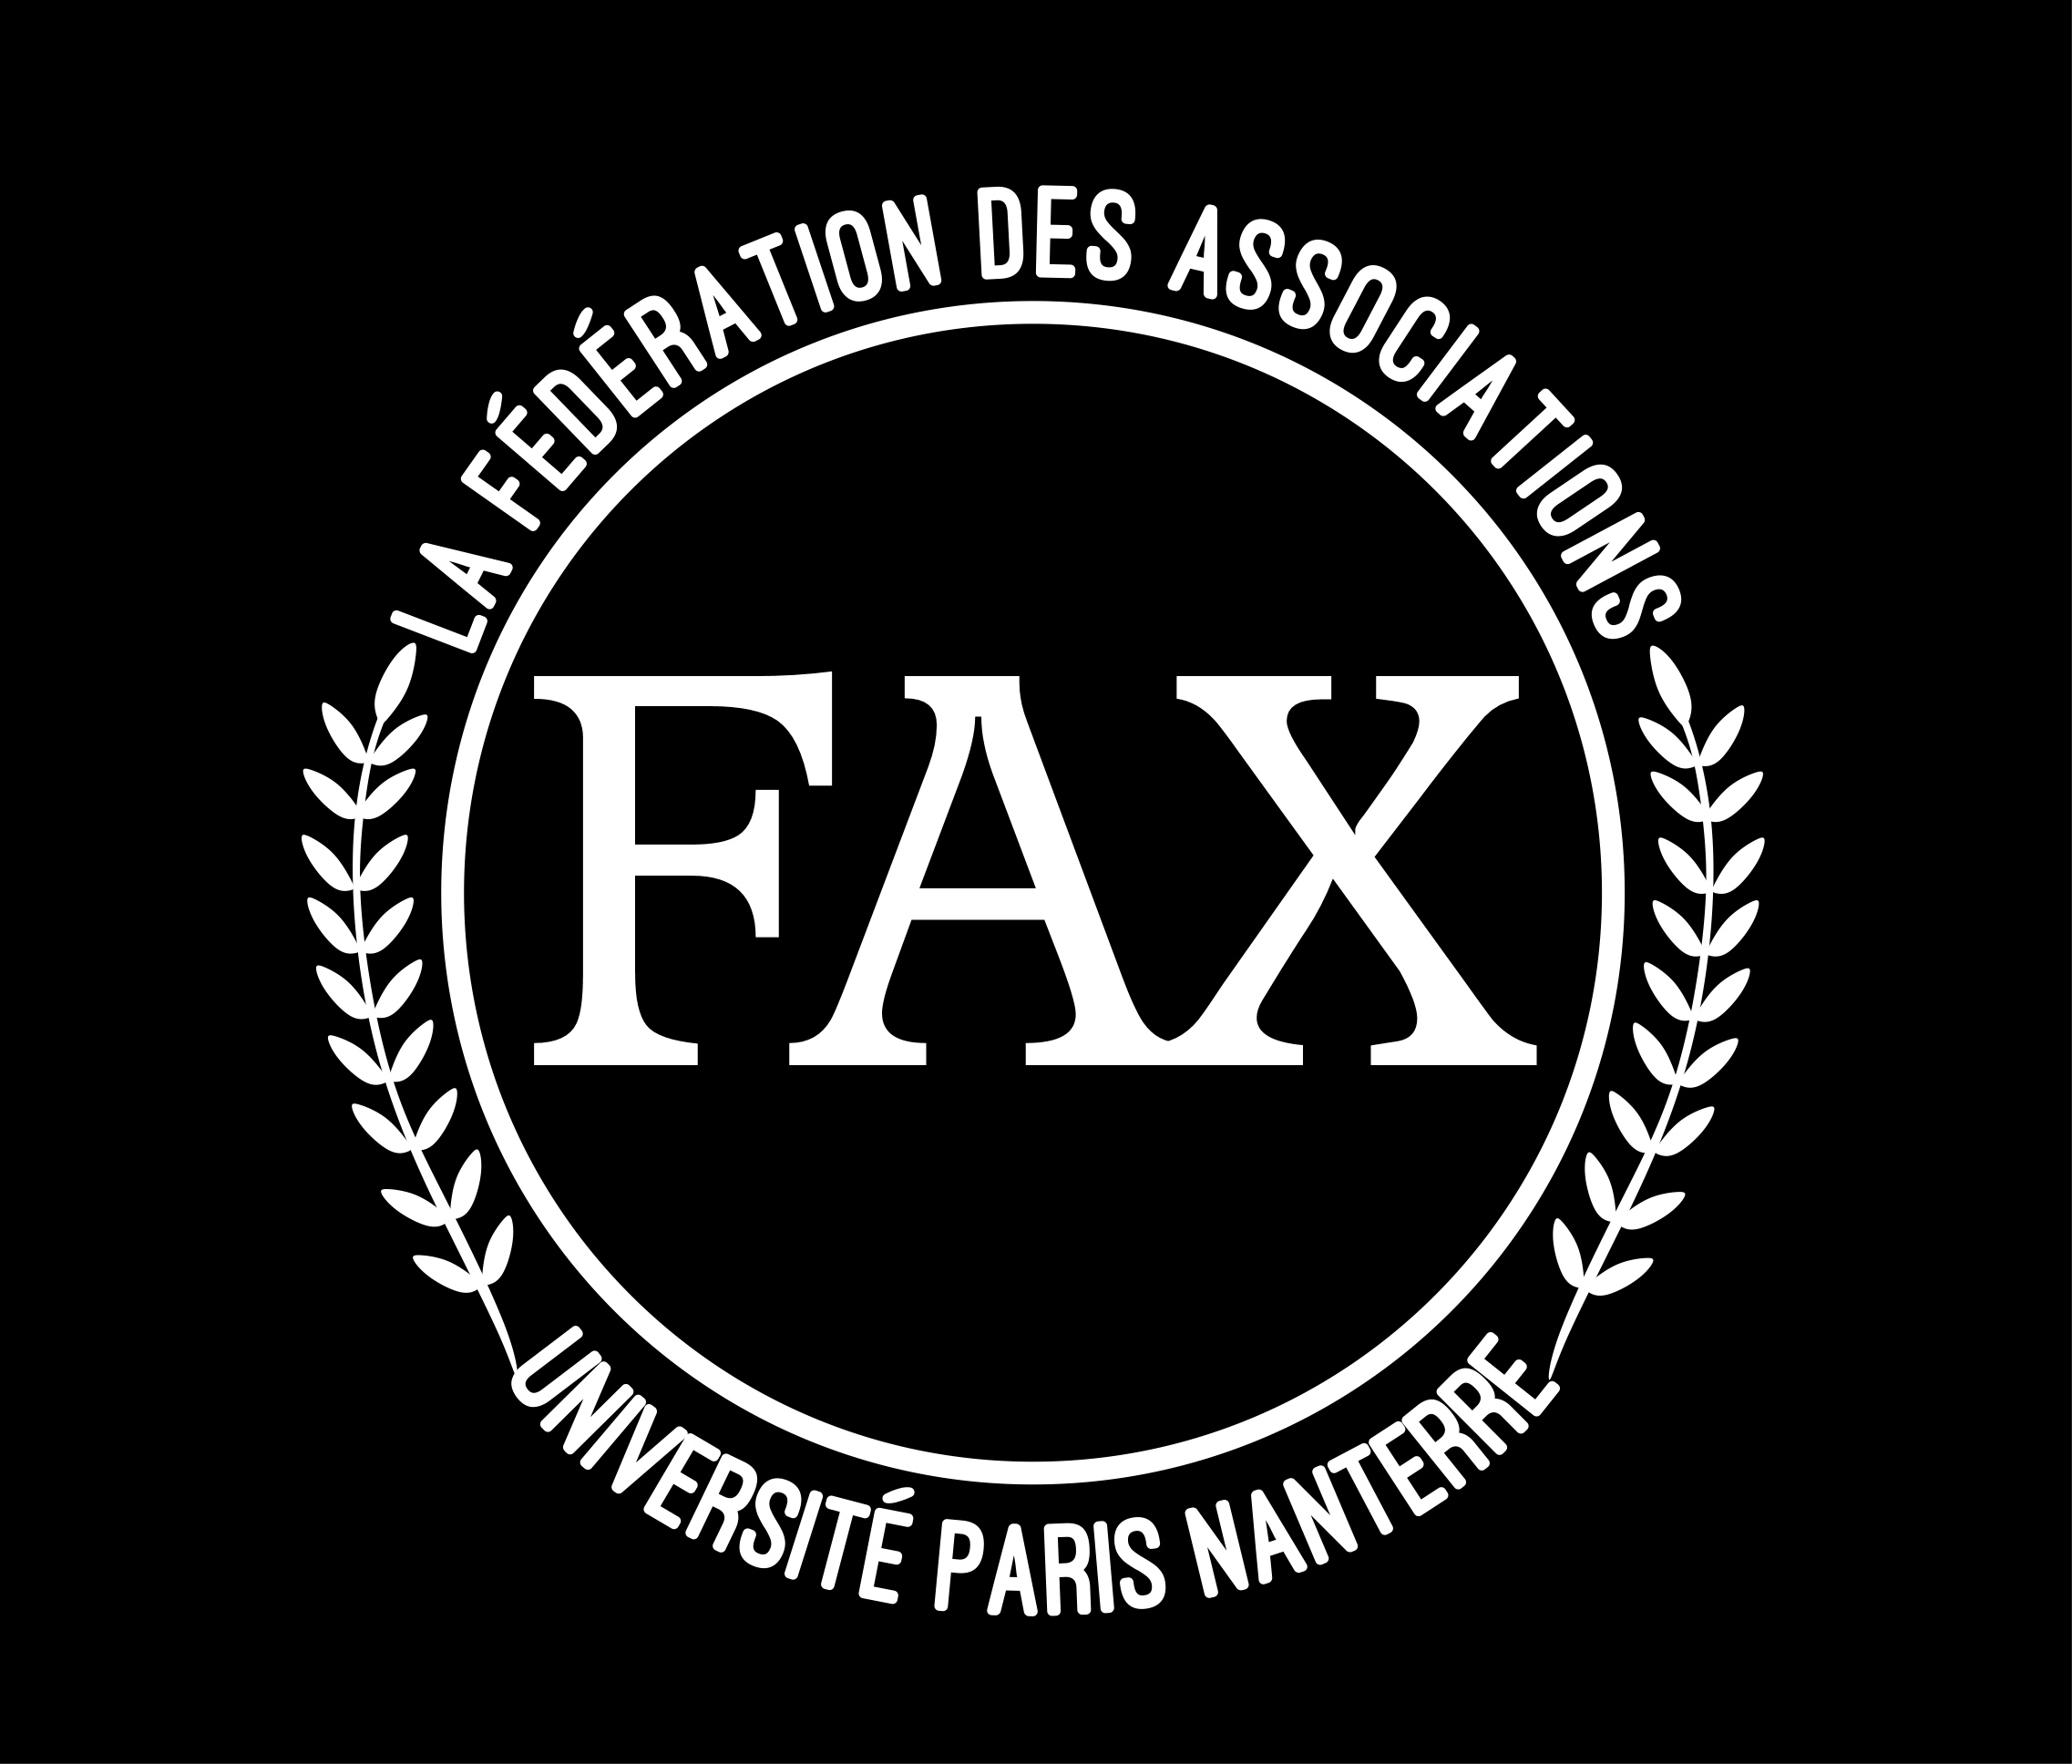 fax (2).jpg